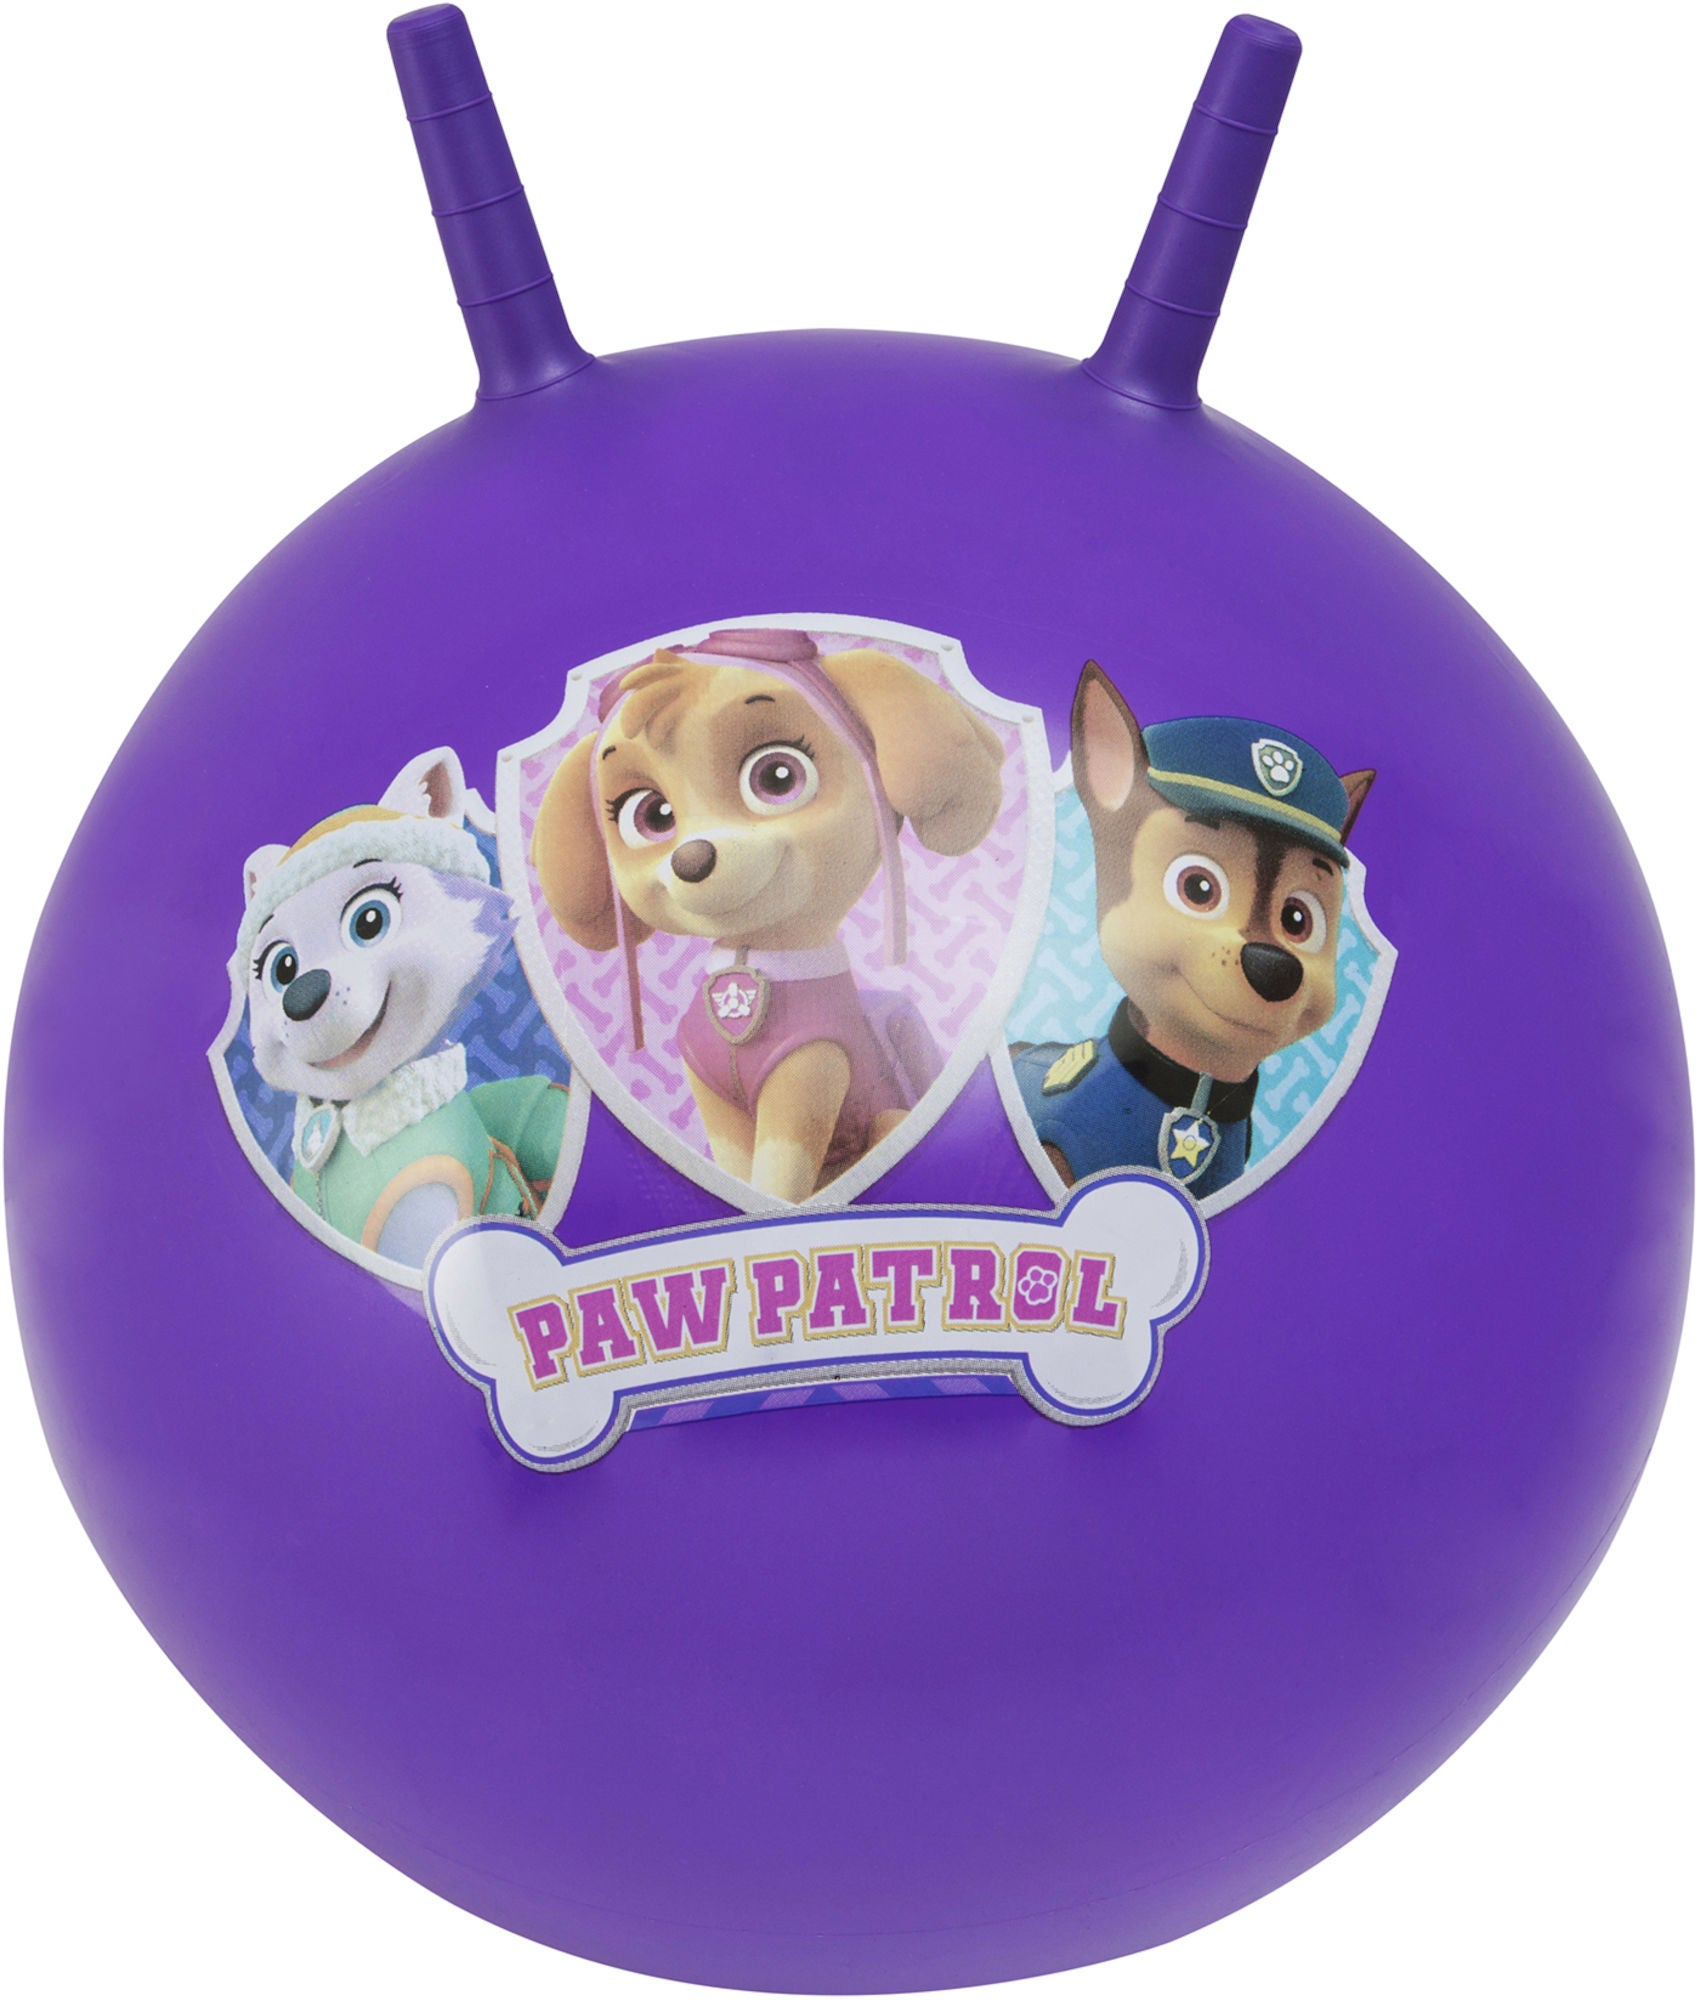 Paw Patrol Hoppeball, Lilla